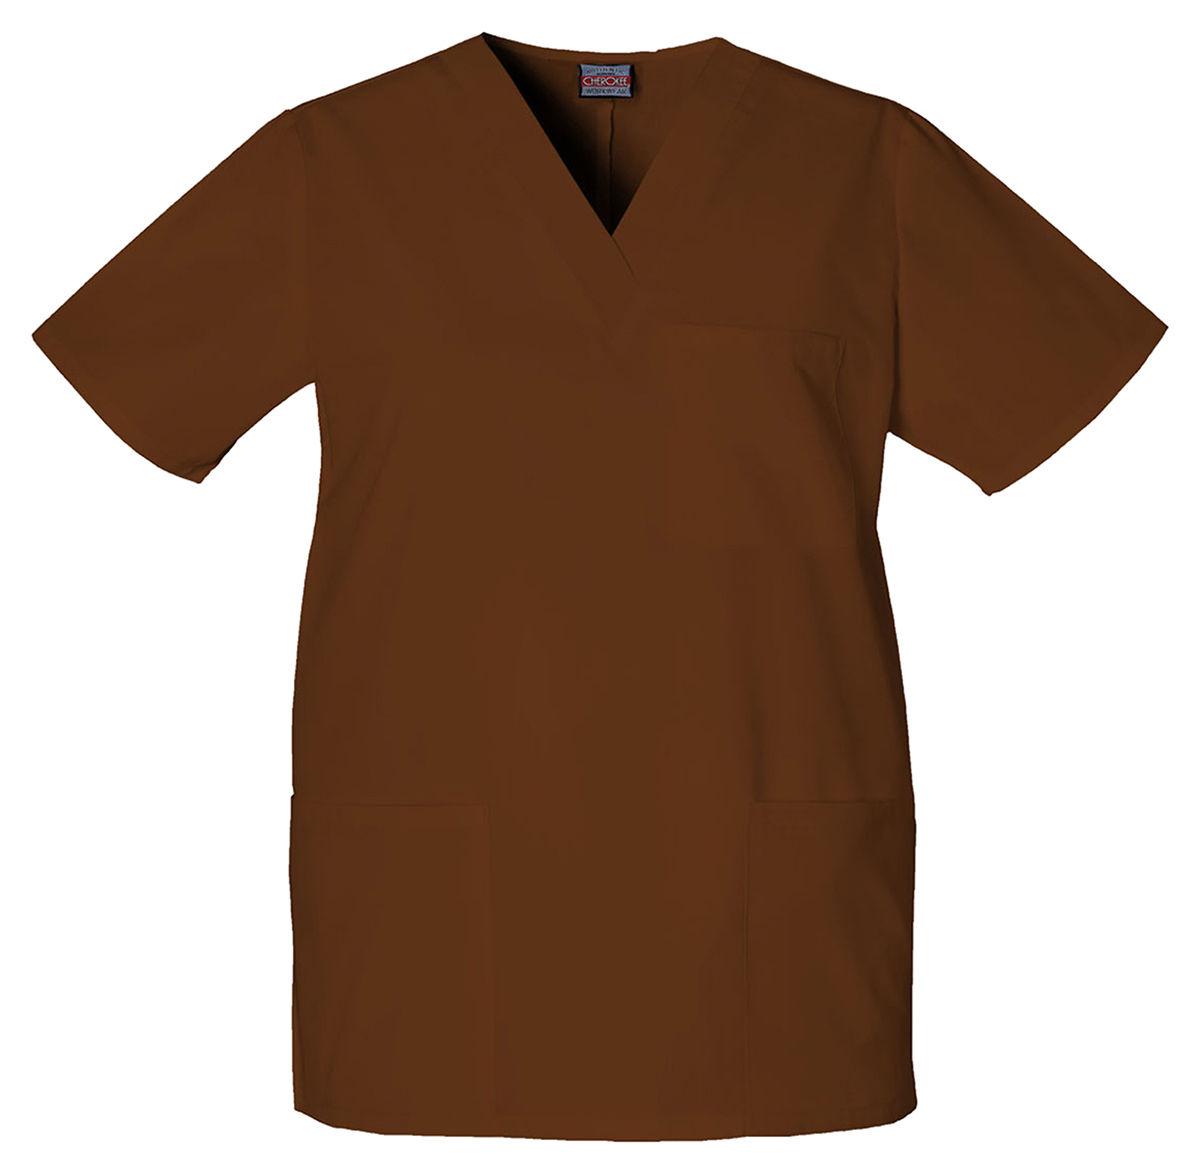 Cherokee-Adult-Workwear-V-Neck-Short-Sleeve-Chest-Pocket-Scrub-Top-4876